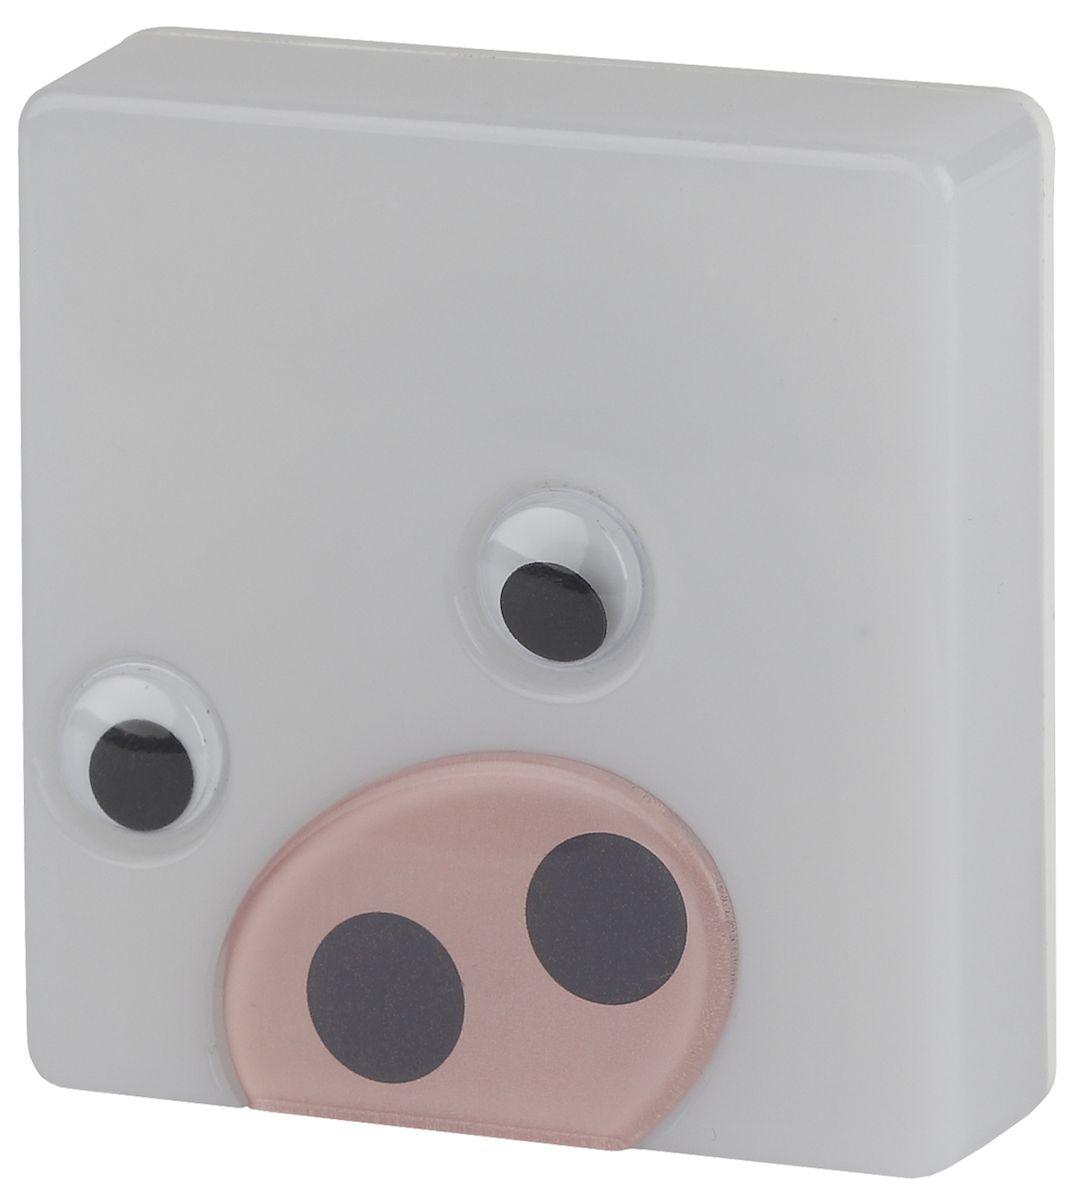 Фото - Ночник ЭРА NN-631-LS-P, цвет: розовый стикеры для стен zooyoo1208 zypa 1208 nn